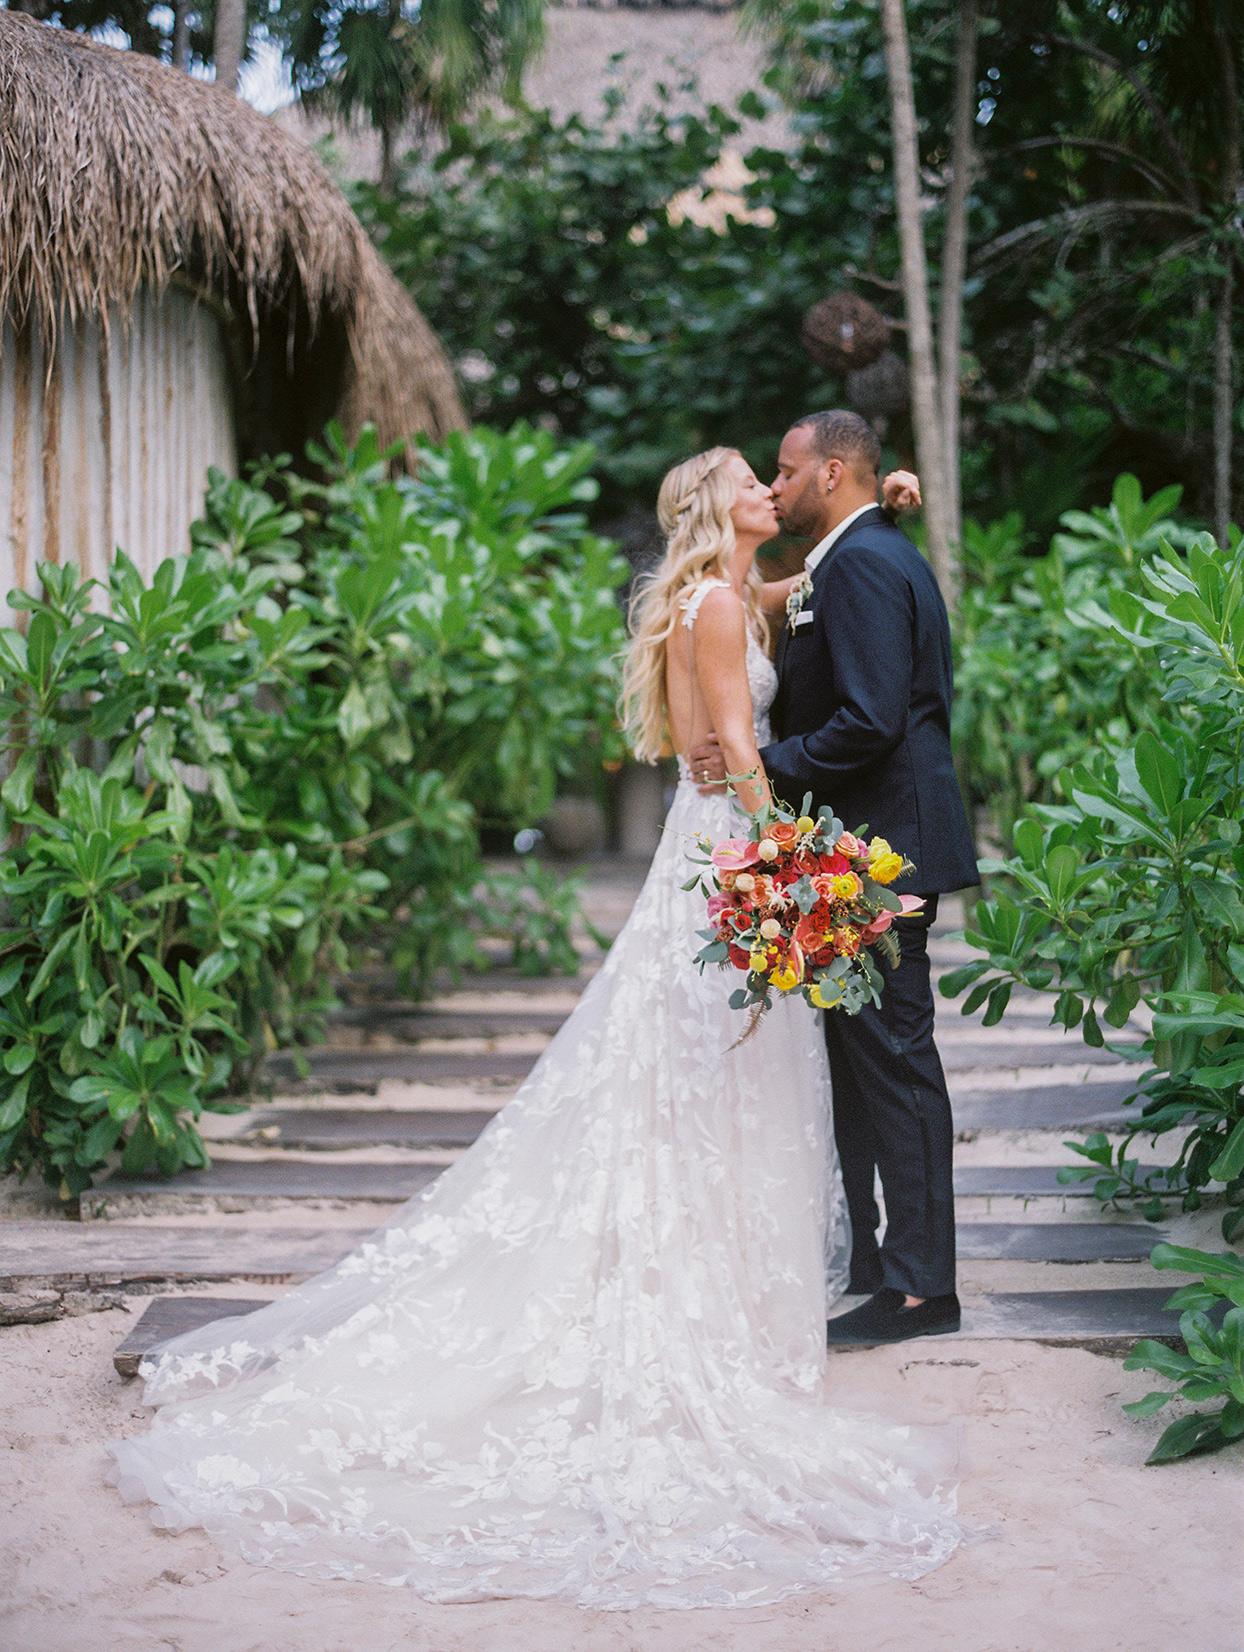 wedding couple kissing on sandy boardwalk